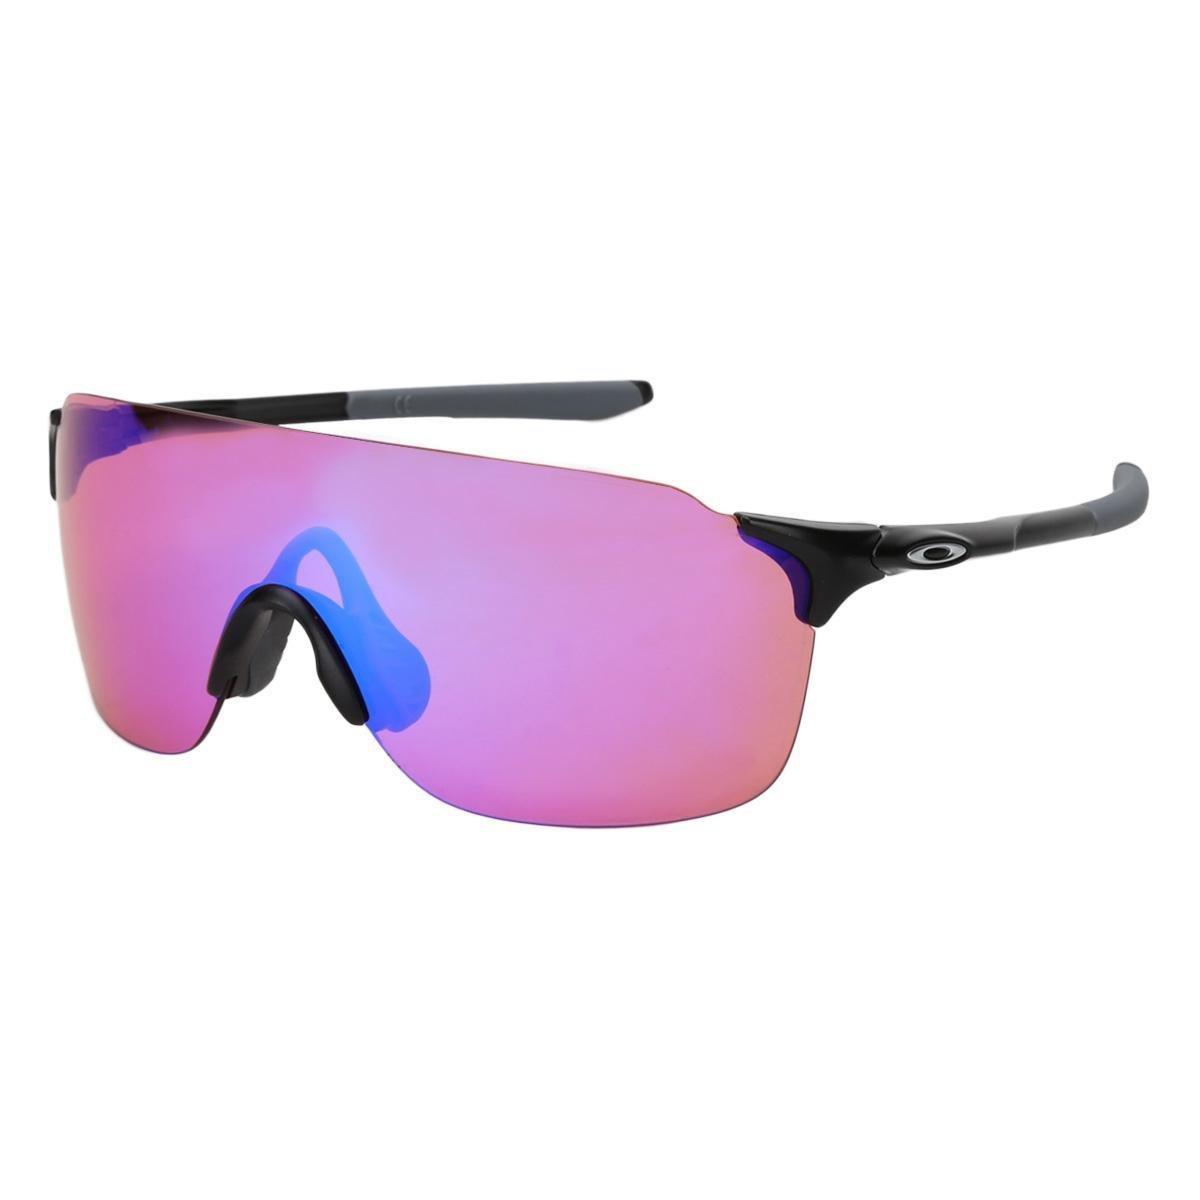 009e38fd988cd Óculos Oakley Evzero Stride Prizm Trail - Preto - Compre Agora ...